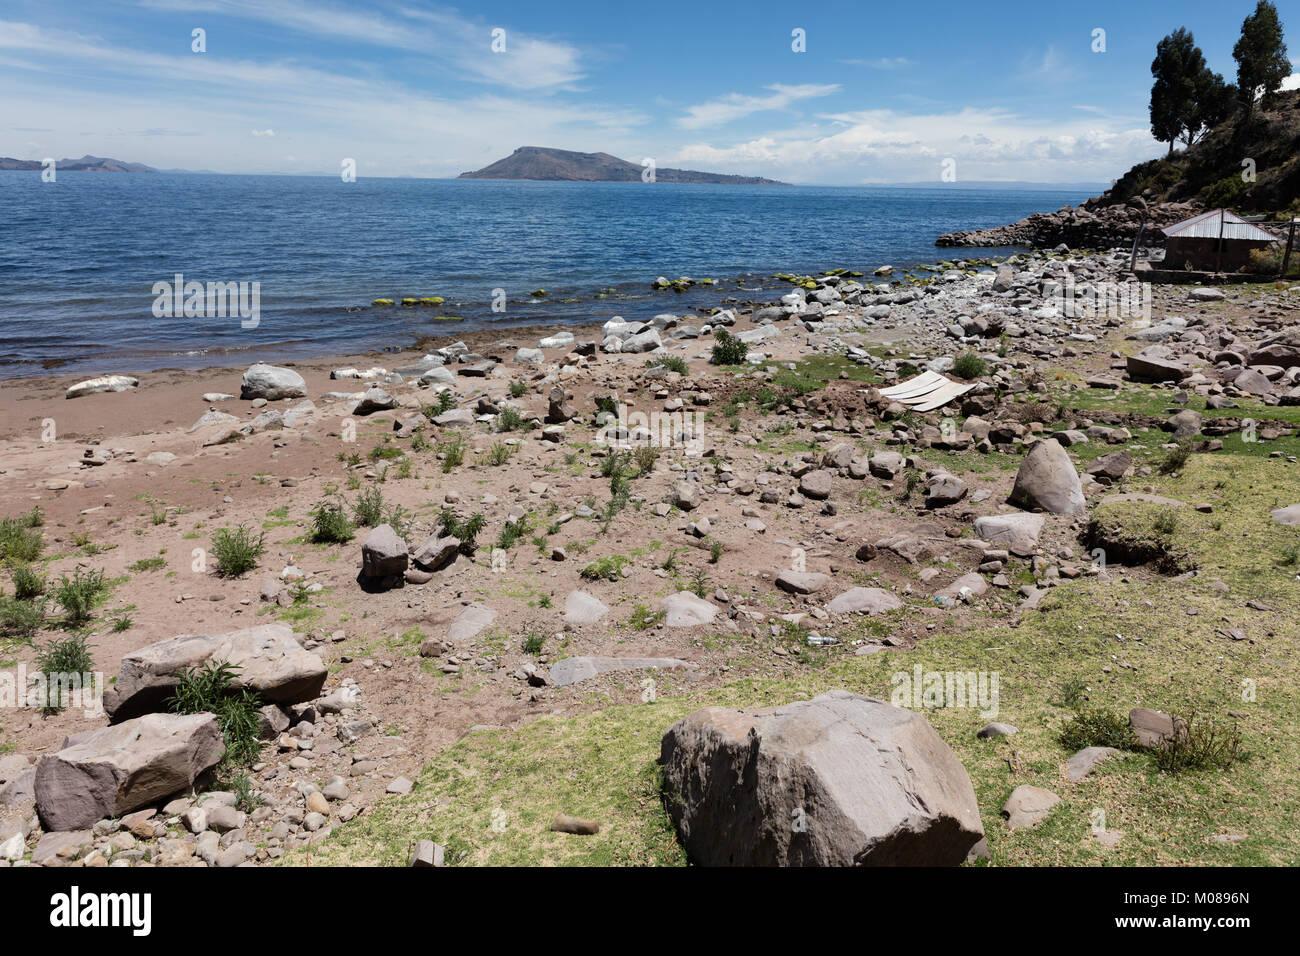 Landscape with view of Amantani Island of Titicaca Lake, Peru - Stock Image